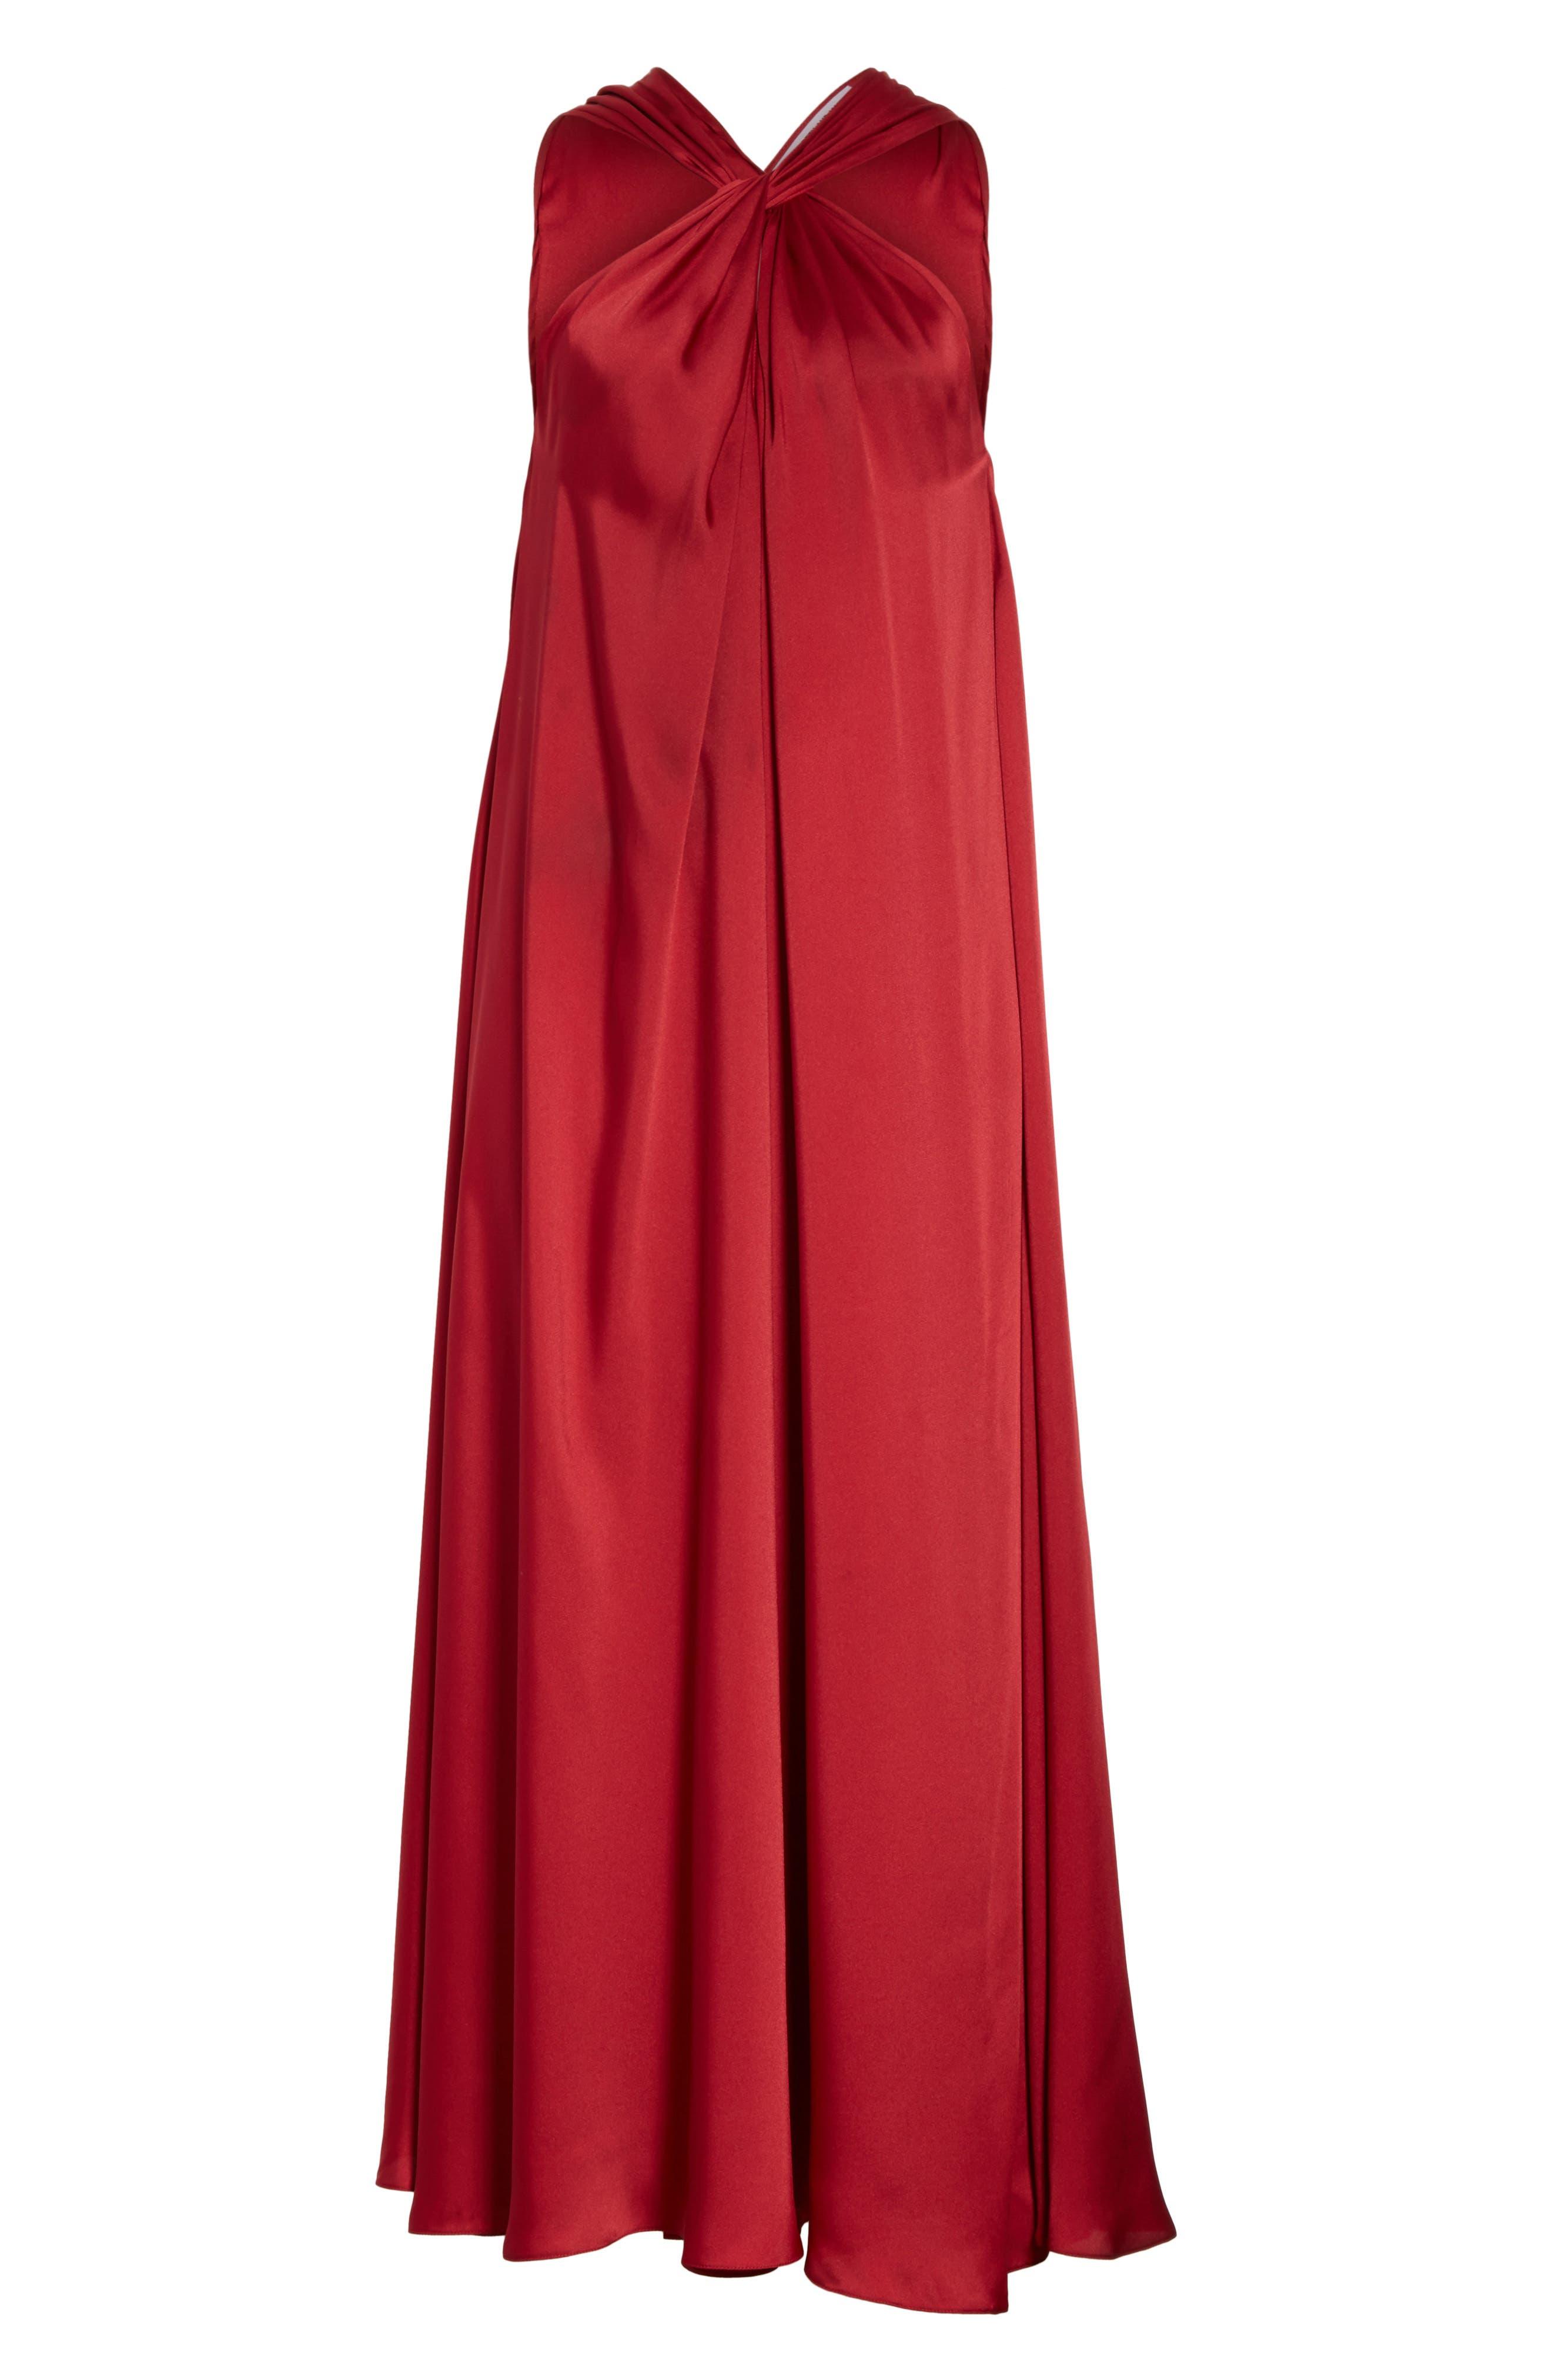 Cavan Twist Neck Satin Dress,                             Alternate thumbnail 6, color,                             Ruby